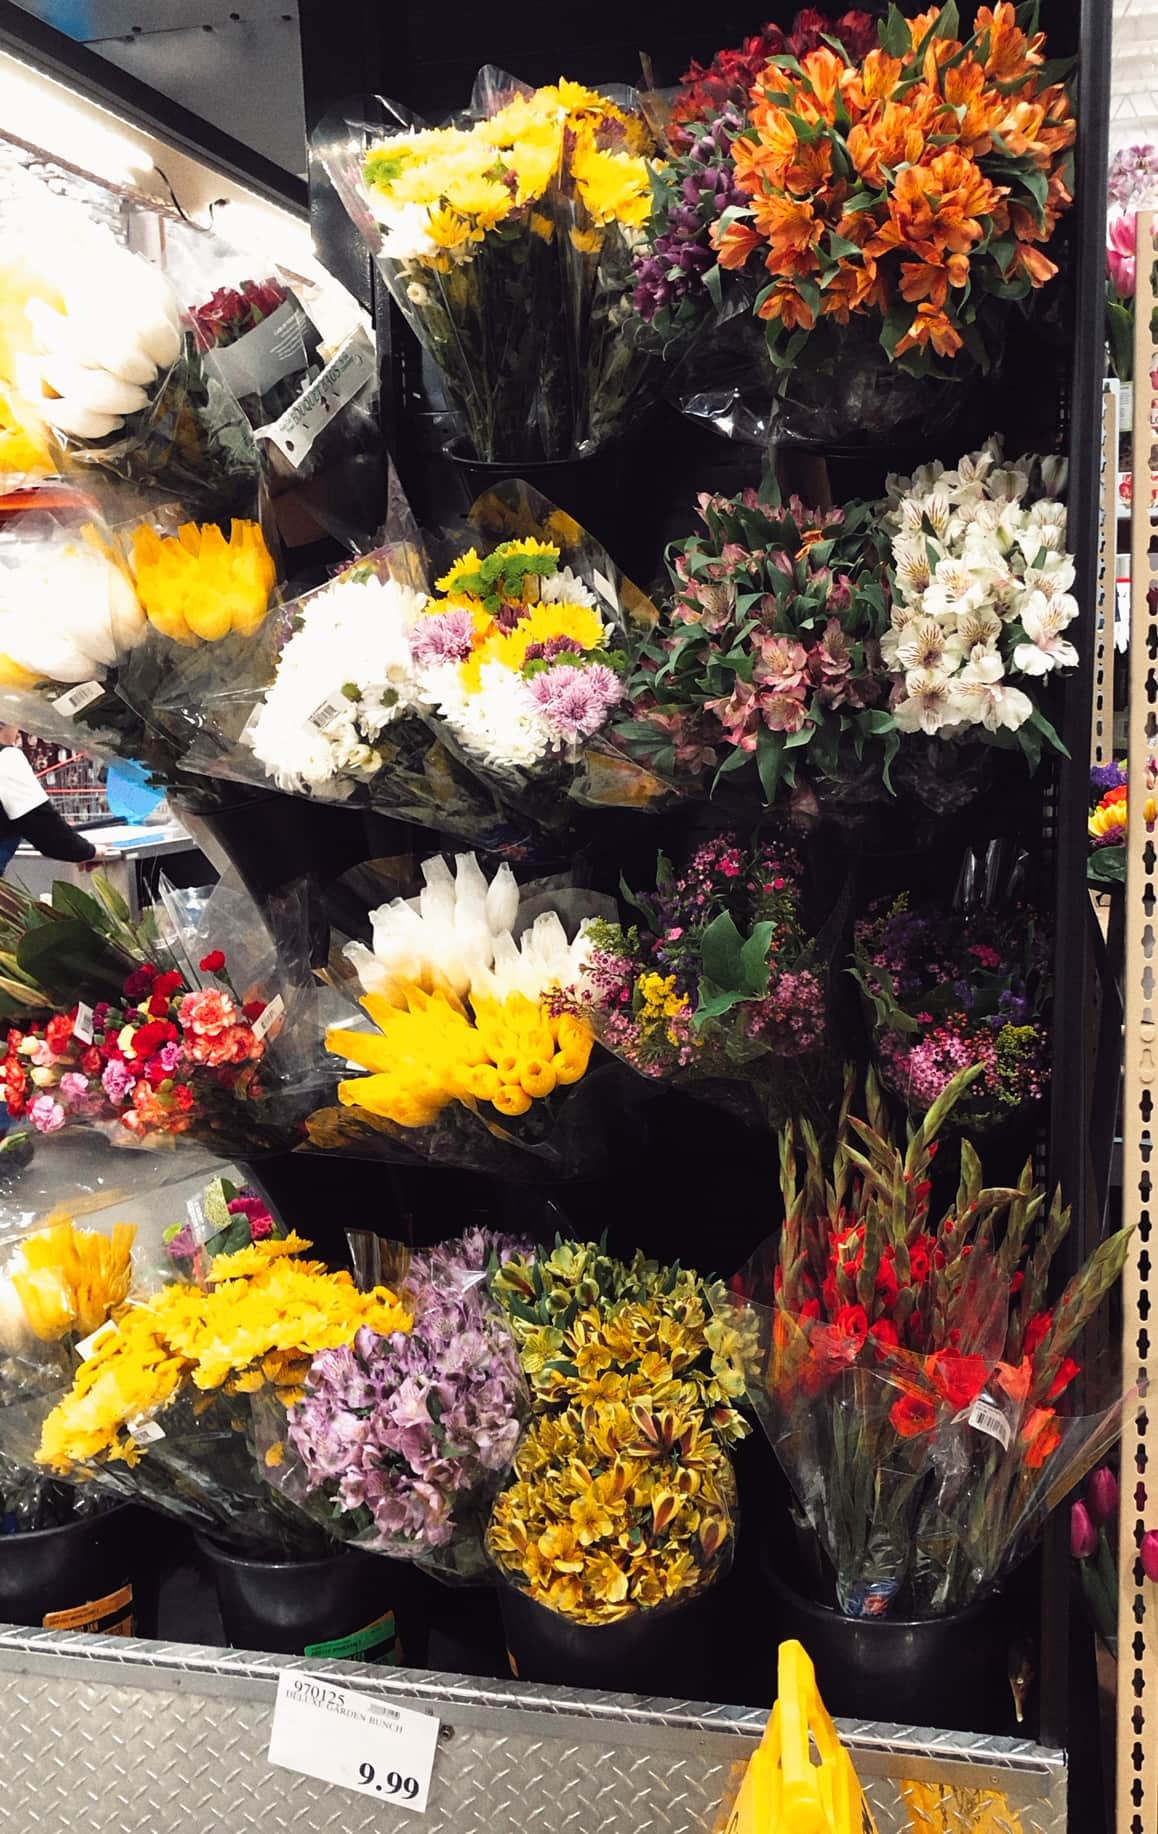 Costco Flowers Beautiful Flowers As Low As 9 99 Bouquet